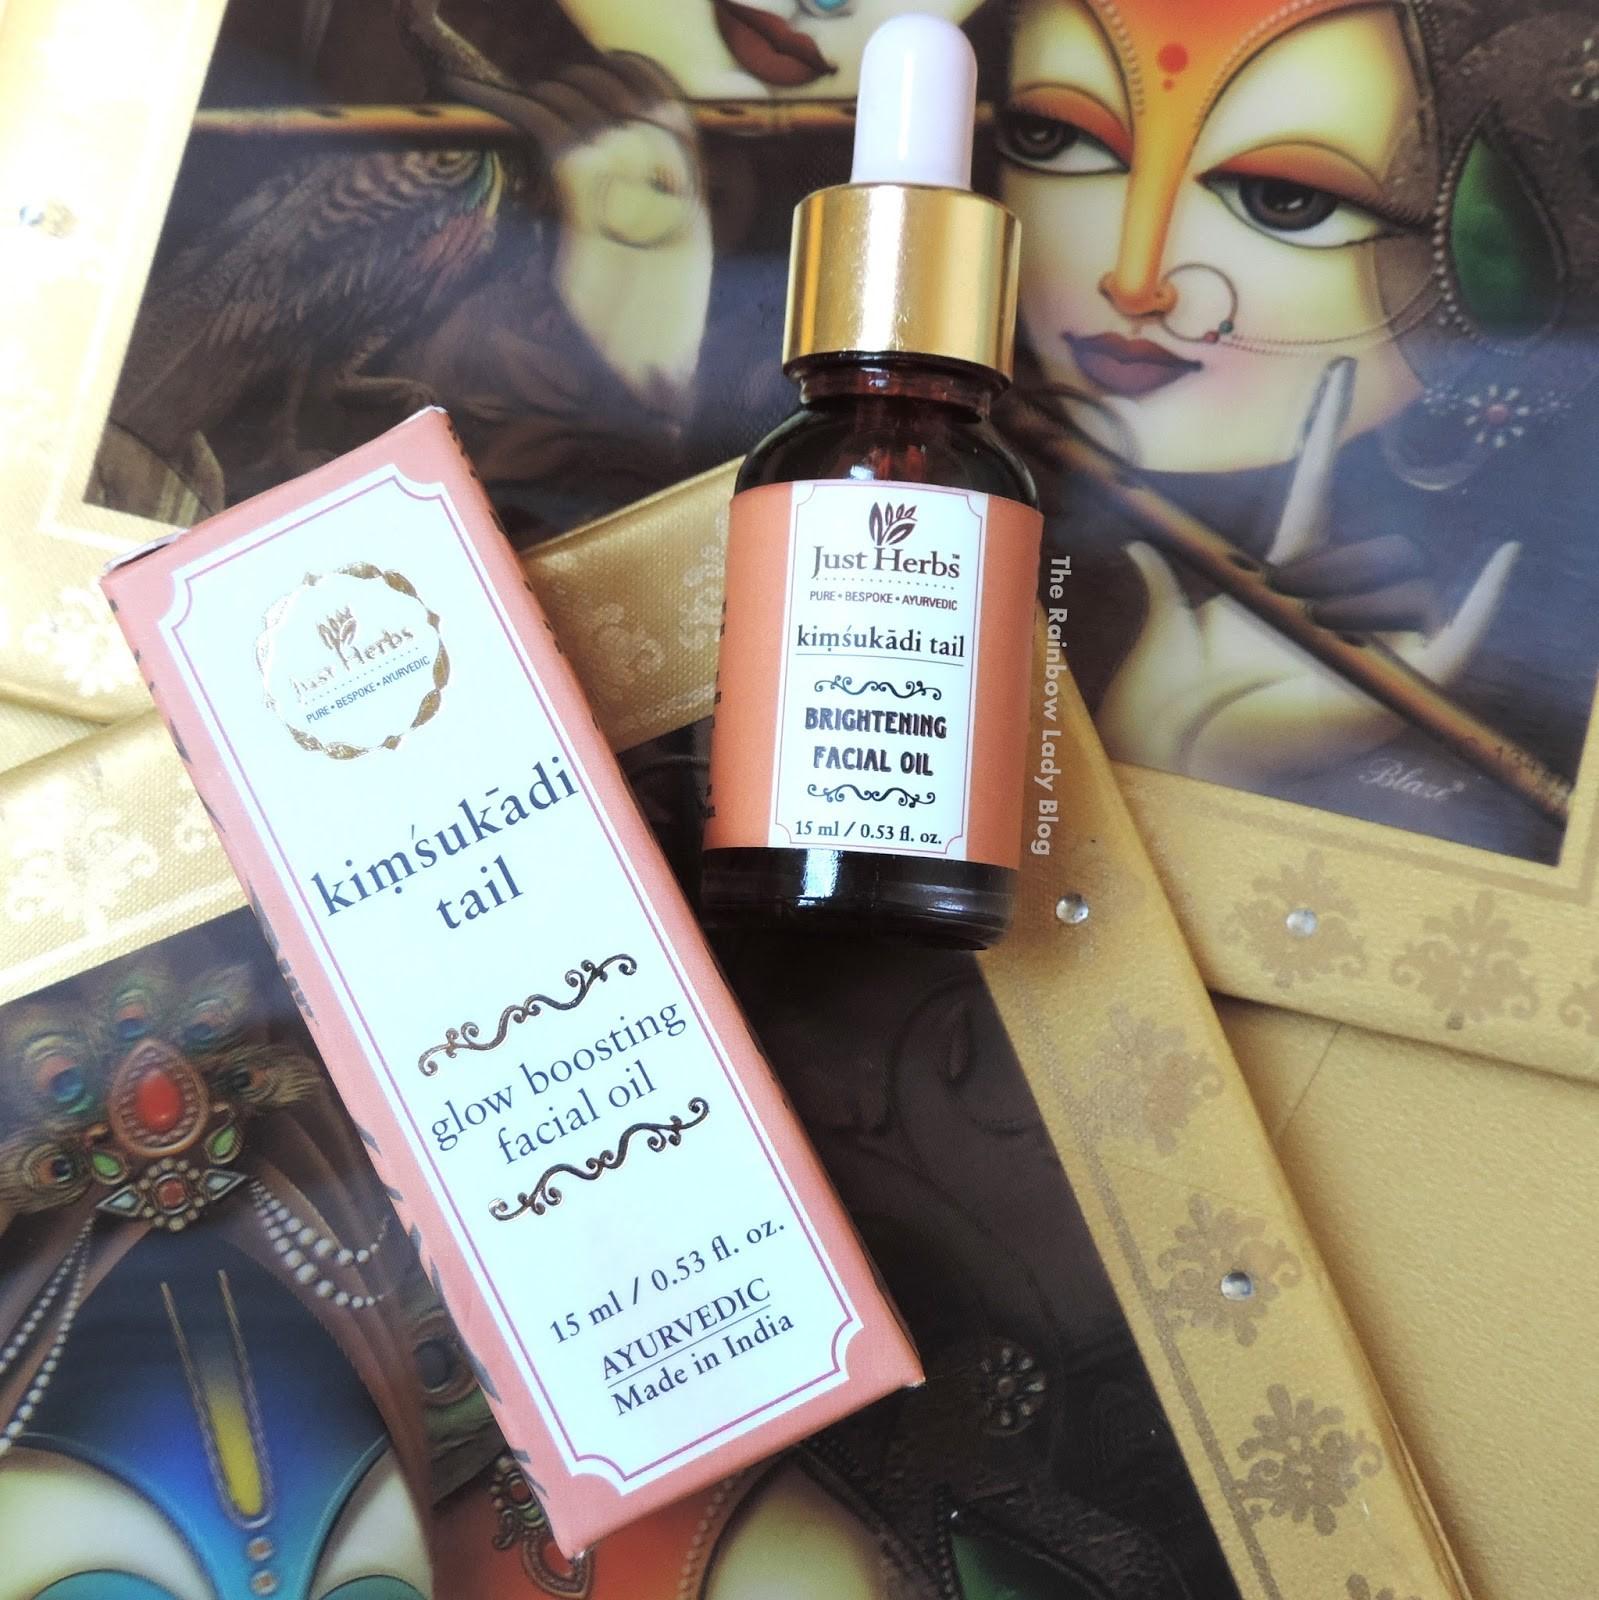 Cách  massage mặt khi dùng Kimsukadi Tail Just Herbs